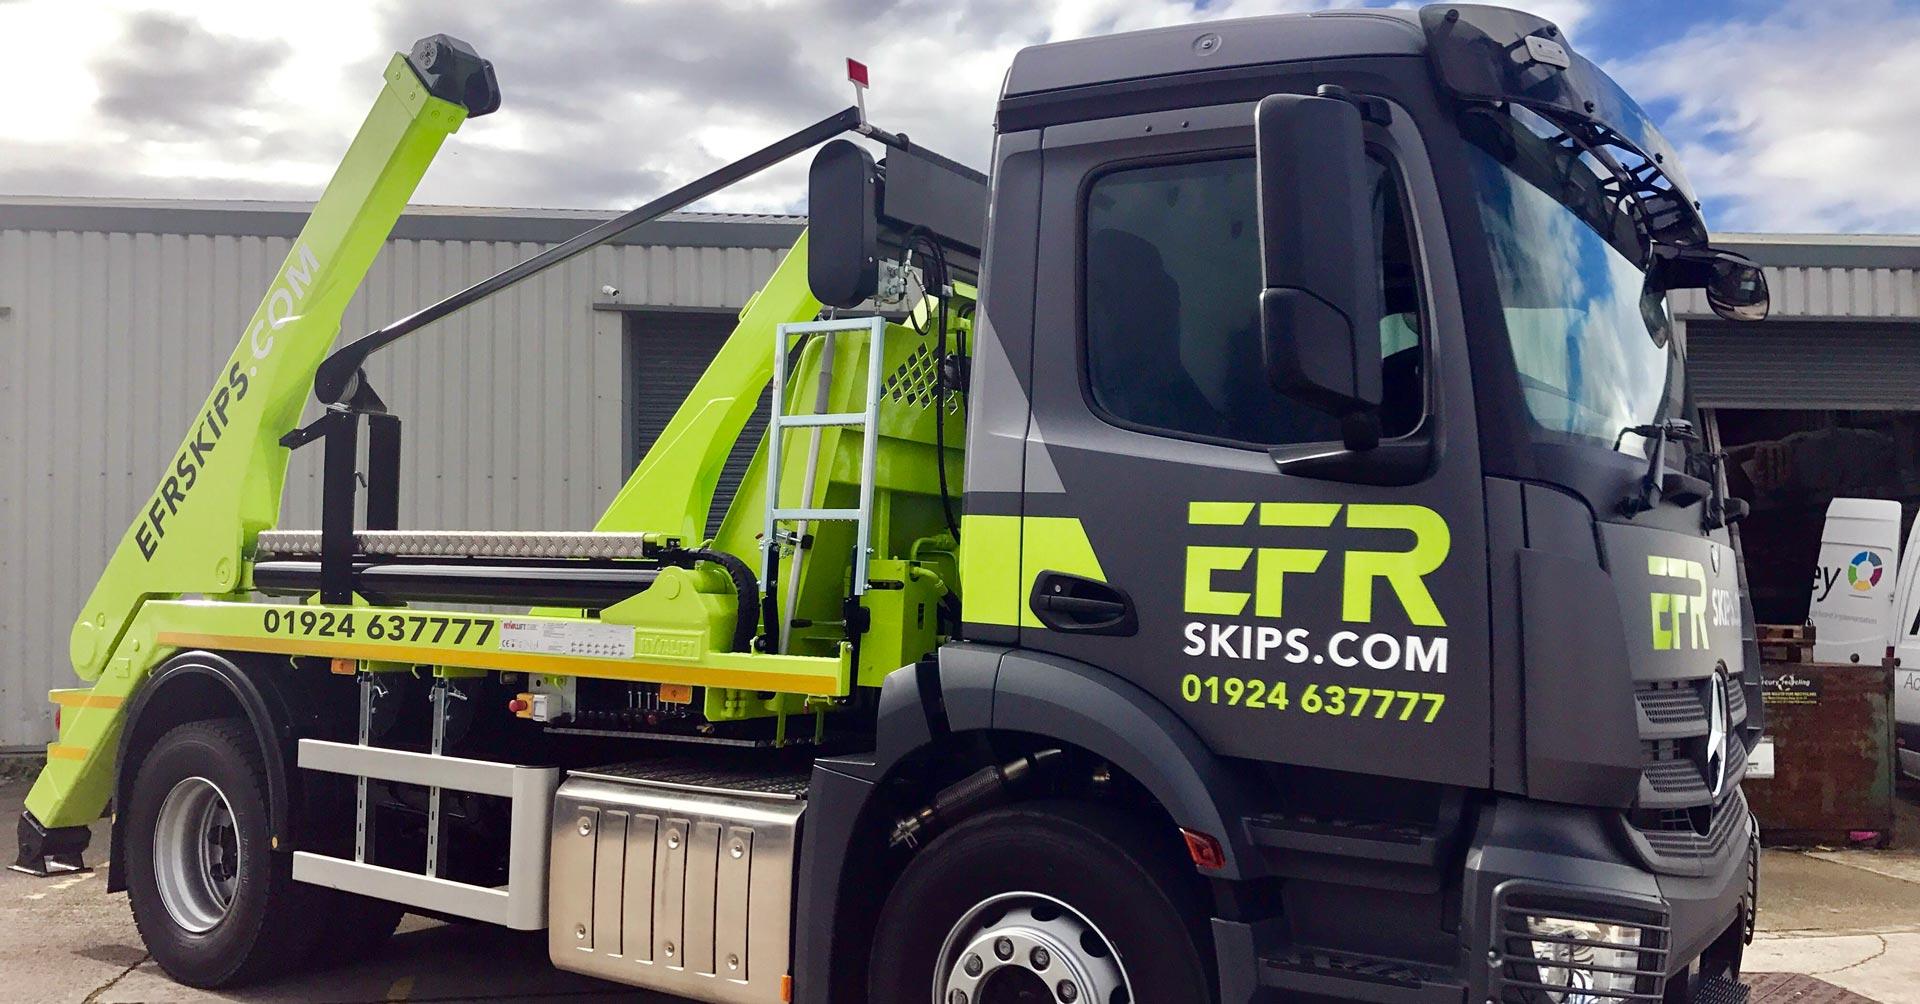 EFR Skip Hire Wakefield Truck